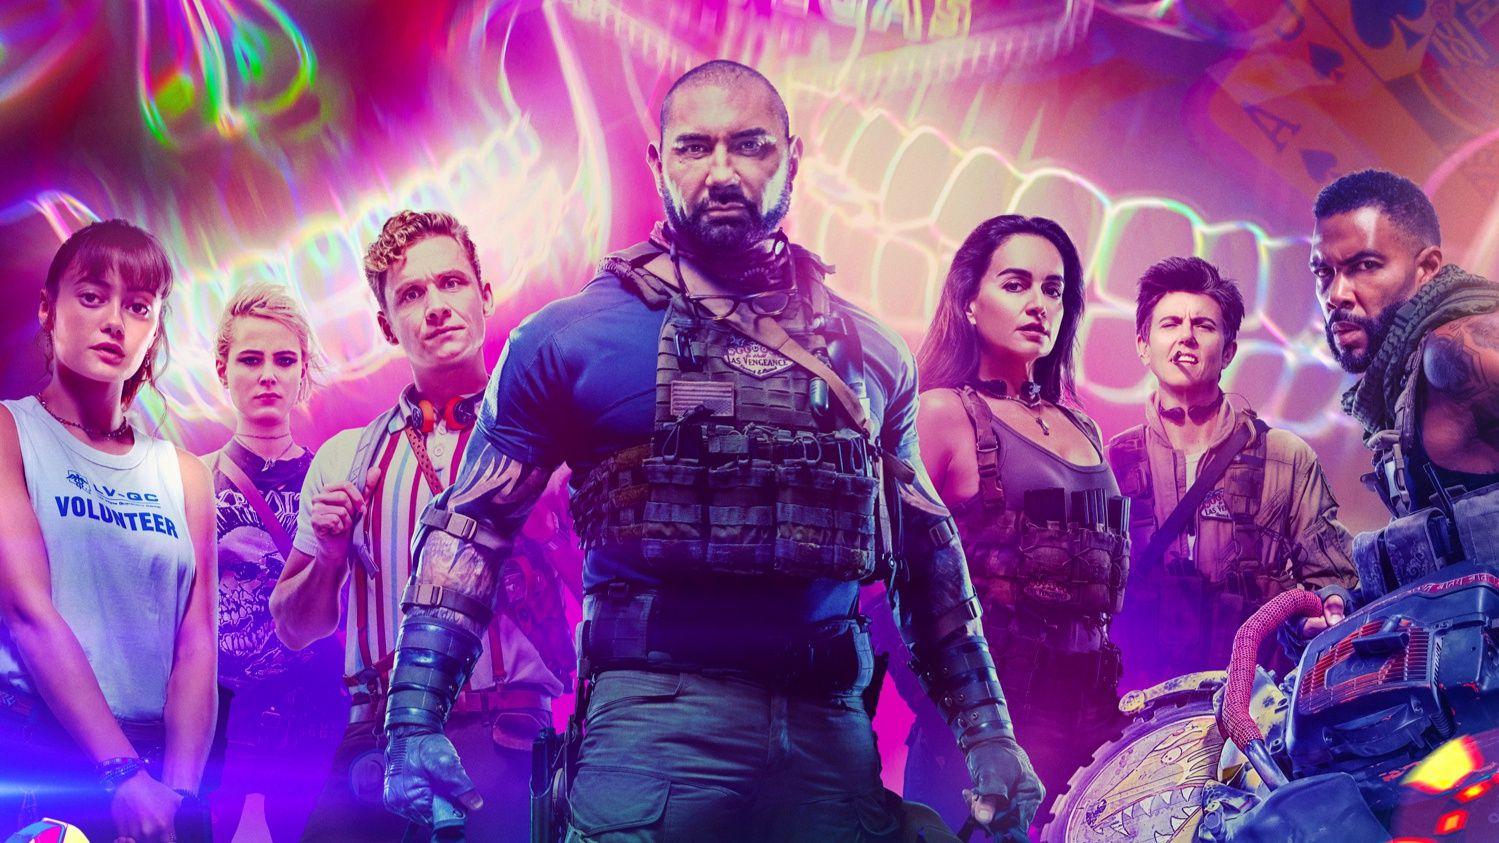 SBT Interior analisa ''Army of the Dead: Invasão a Las Vegas'', novo filme da Netflix -